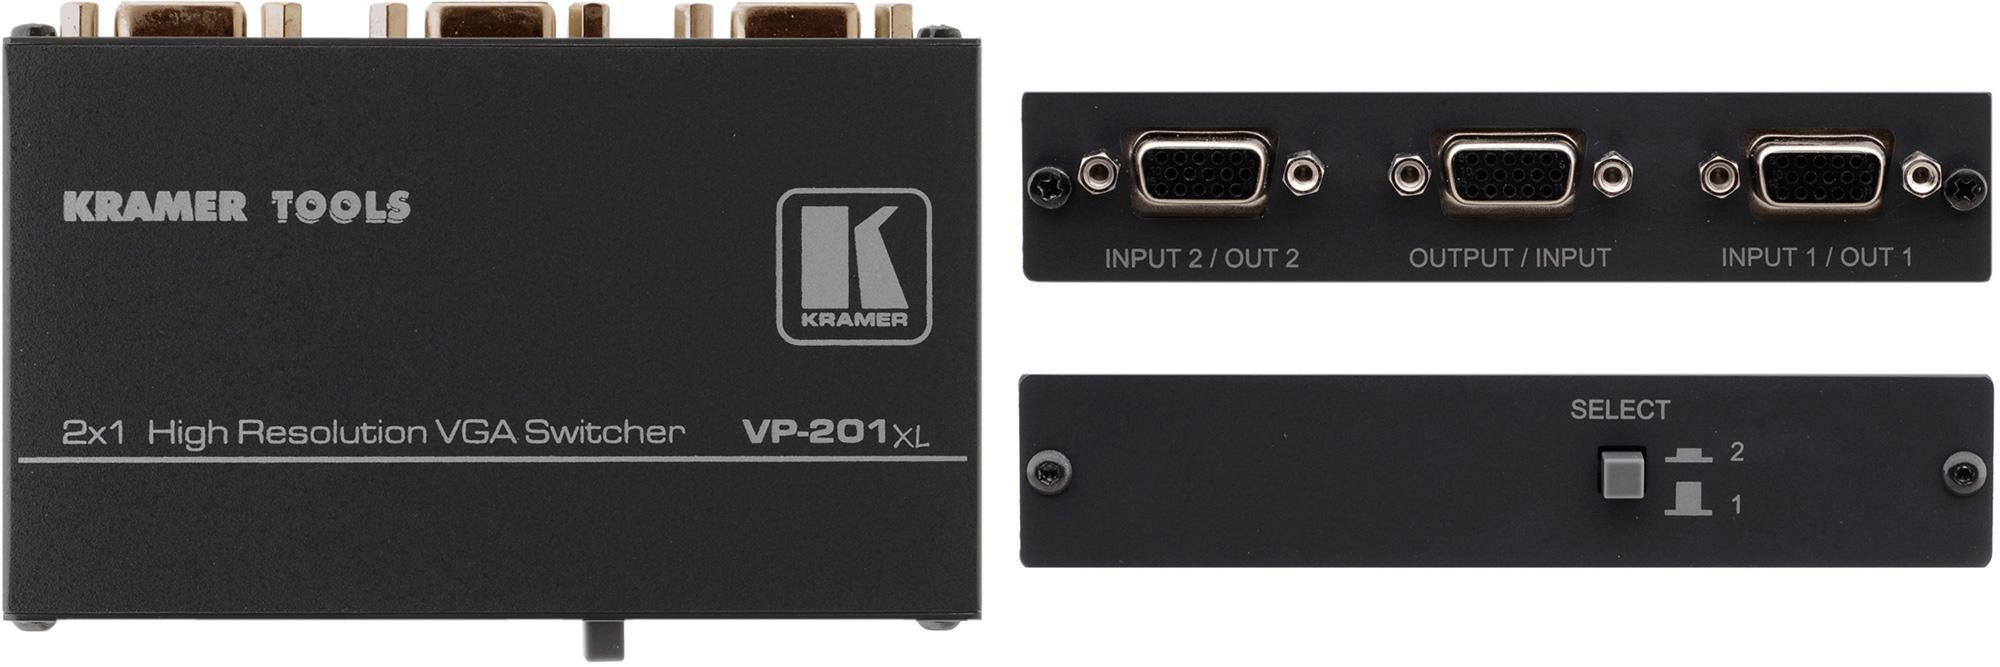 Kramer VP-201XL 2x1 VGA Switcher VP-201XL